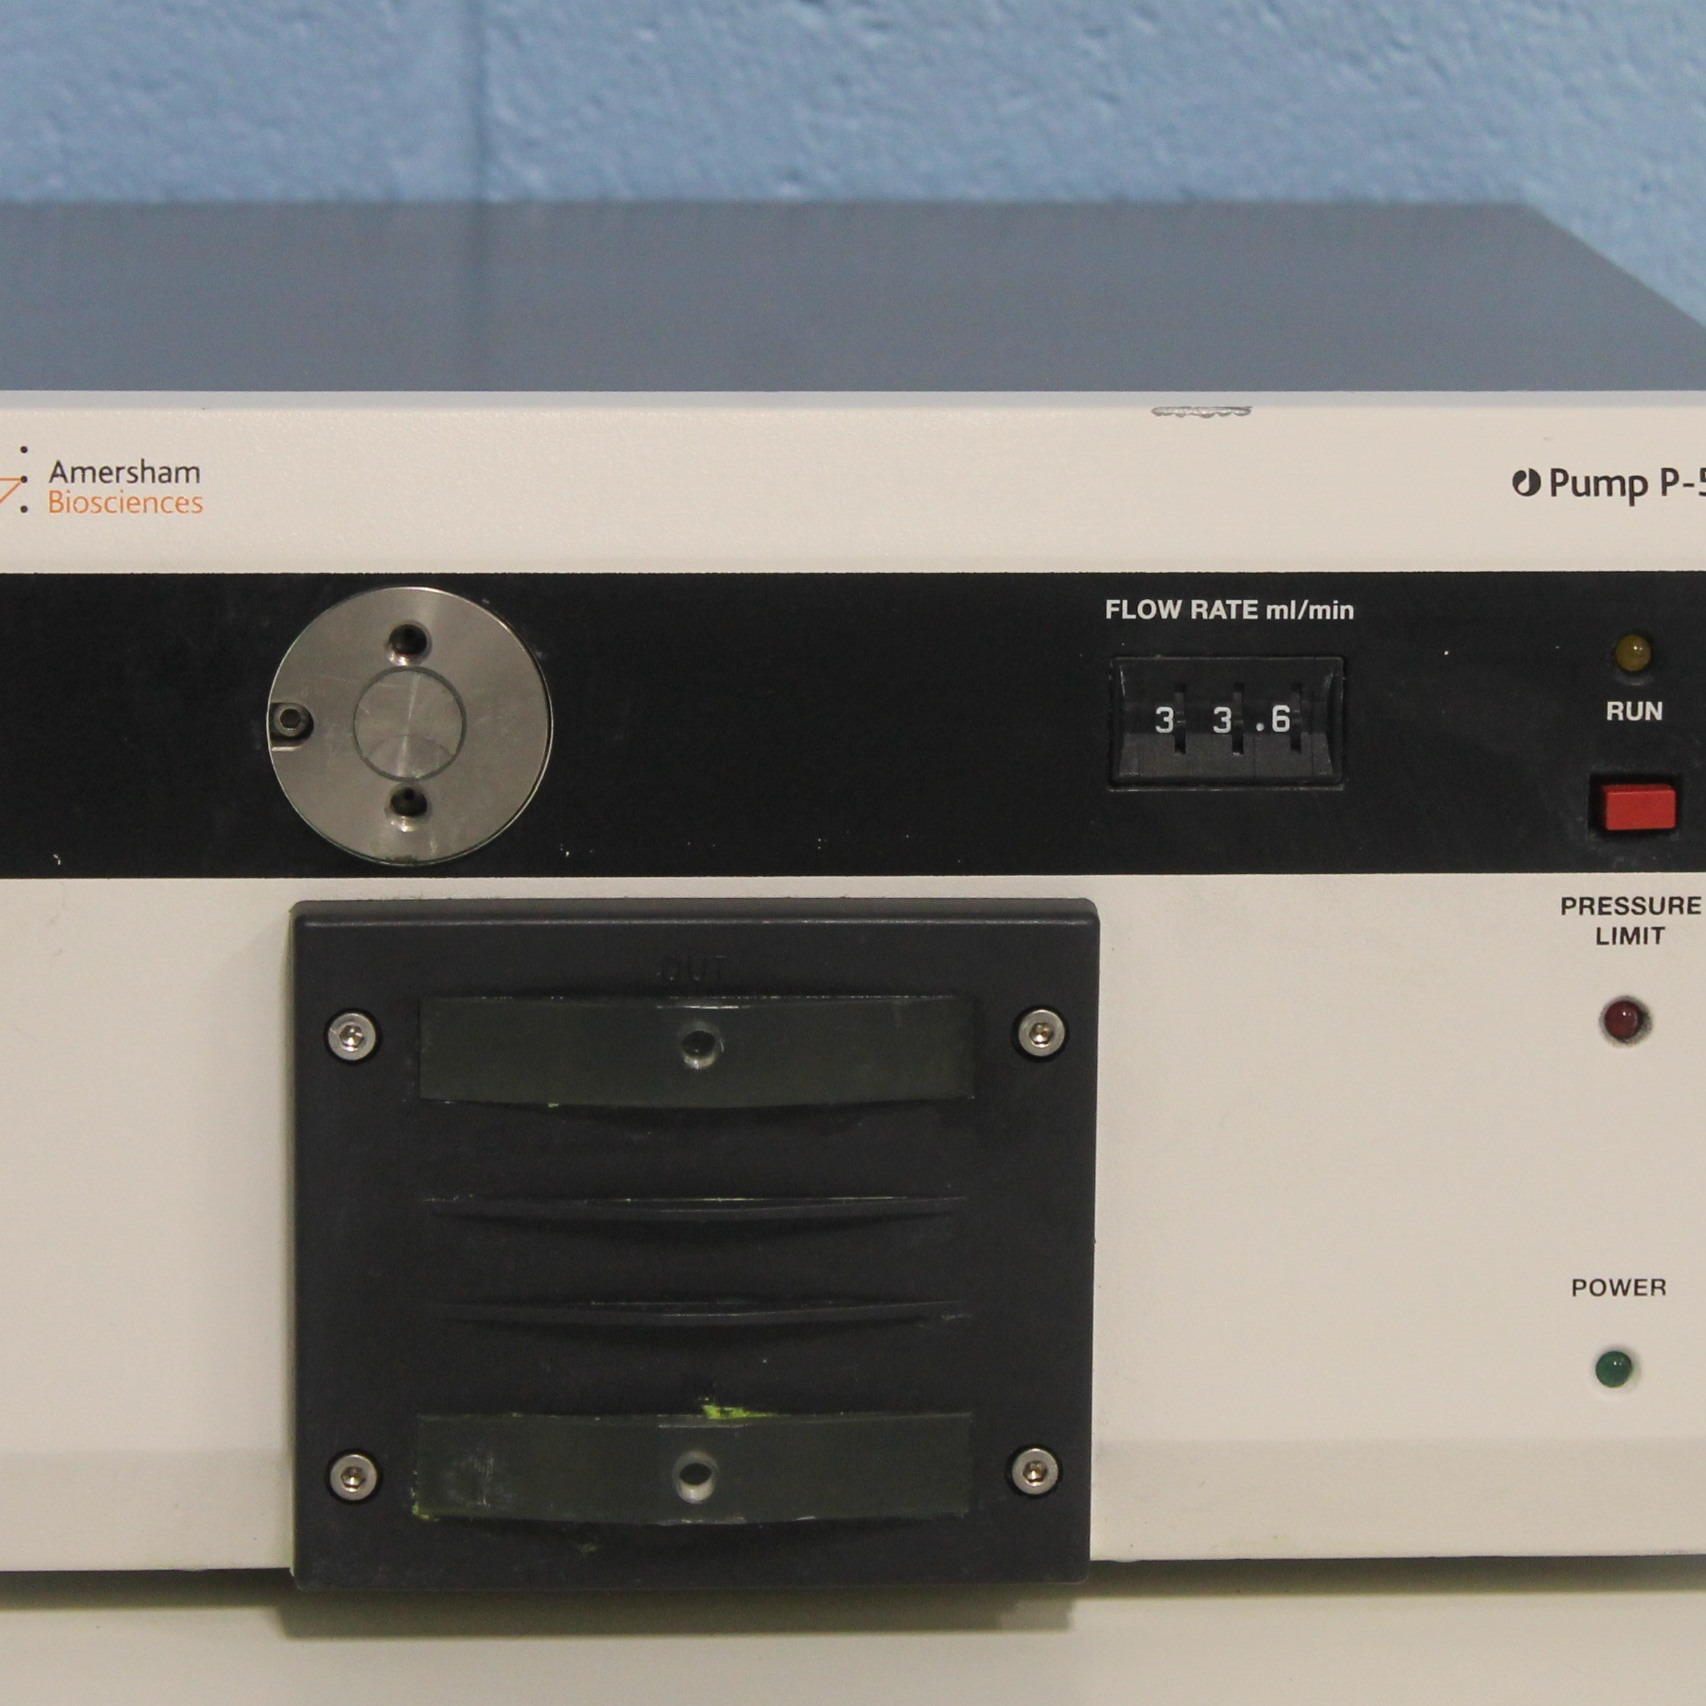 Amersham Biosciences P-50 Pump Image